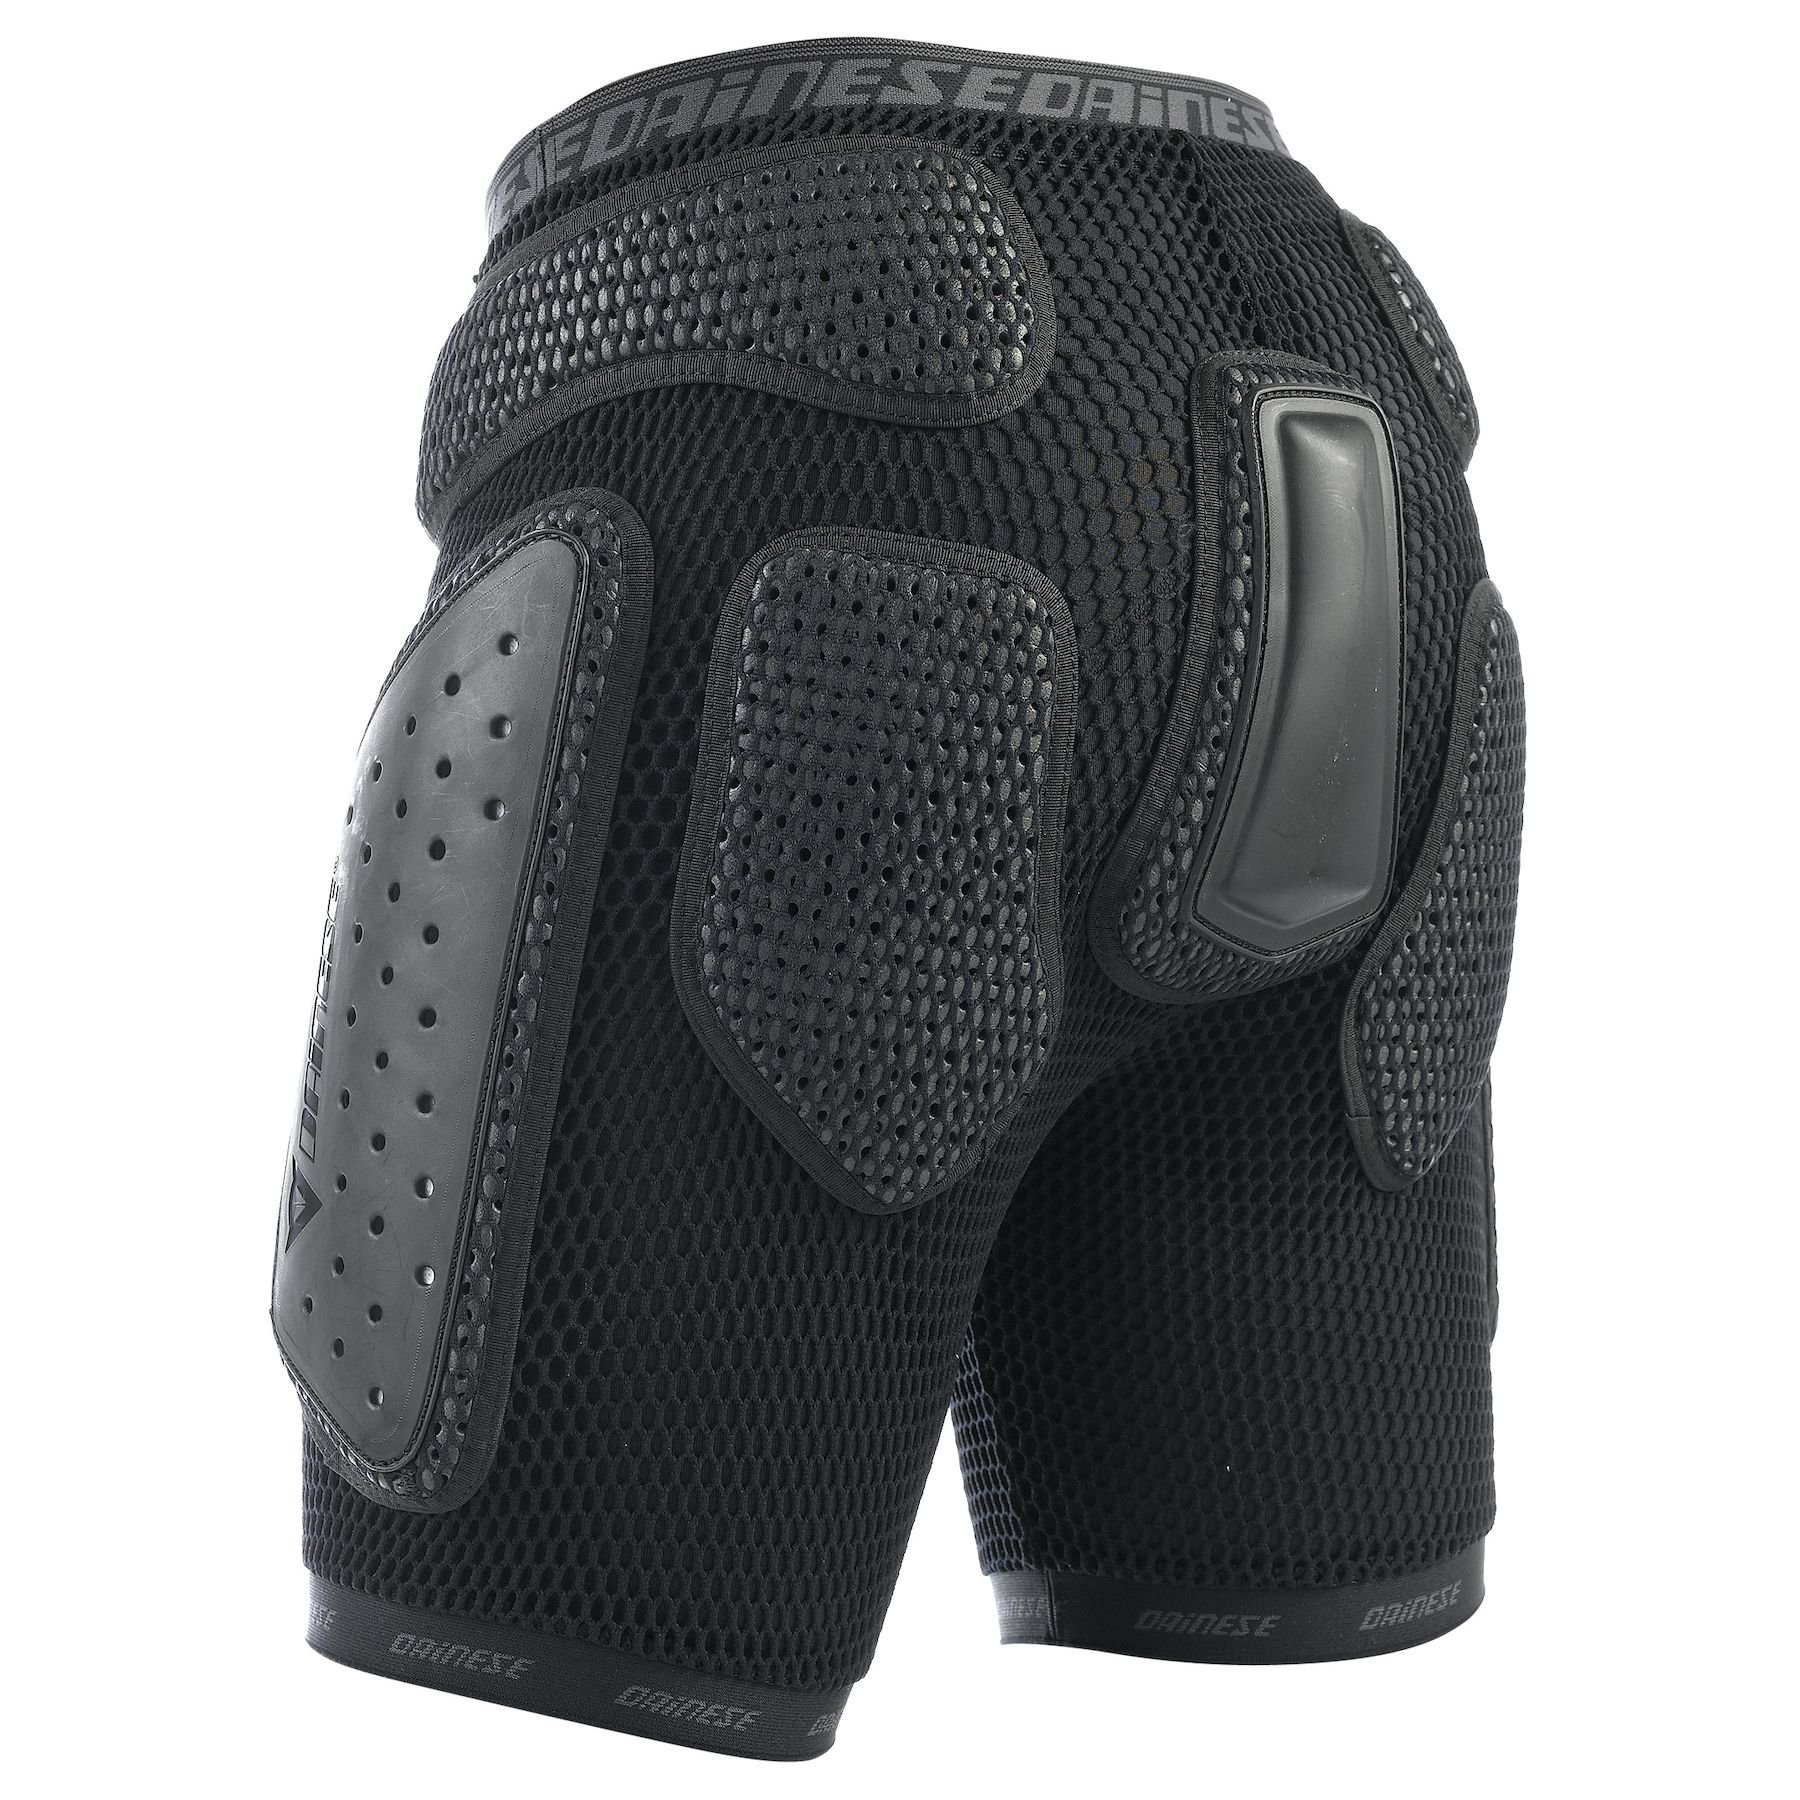 Dainese Hard Shorts E1 Protection Black XS